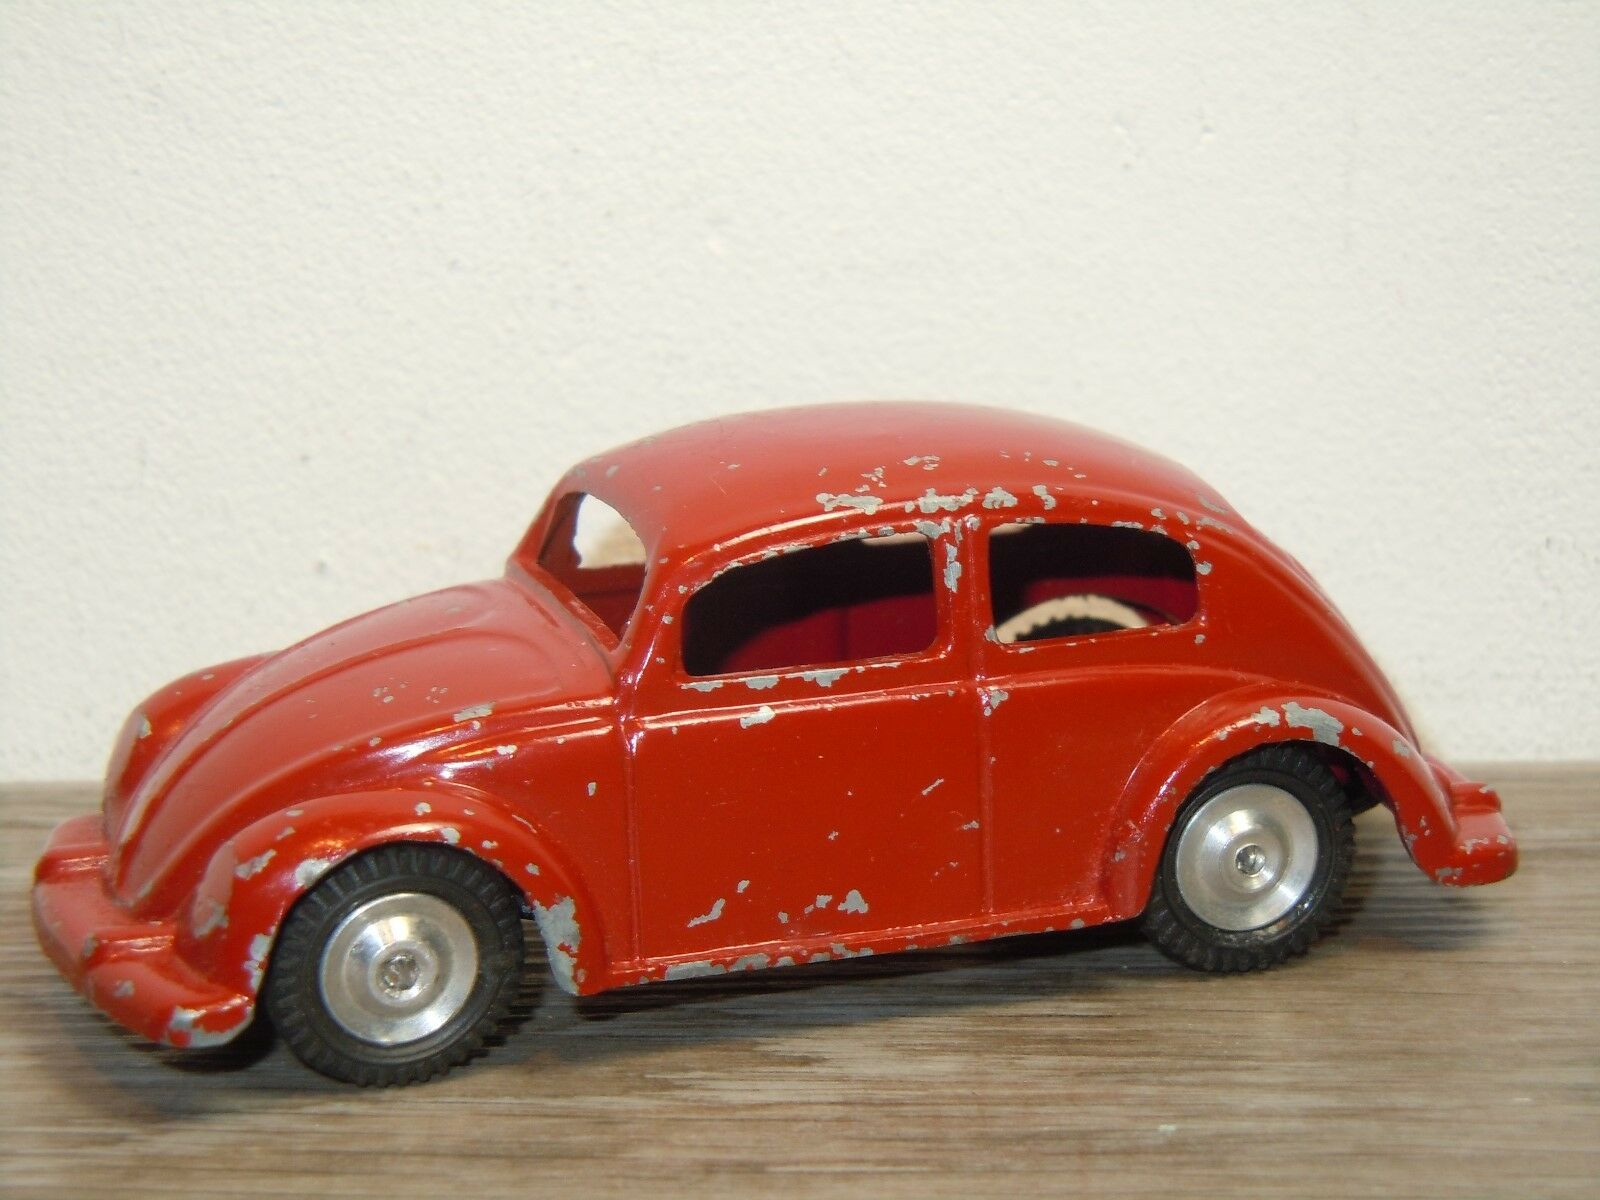 VW Volkswagen Beetle Oval Window - Sweering Holland - Made in Germany 35905